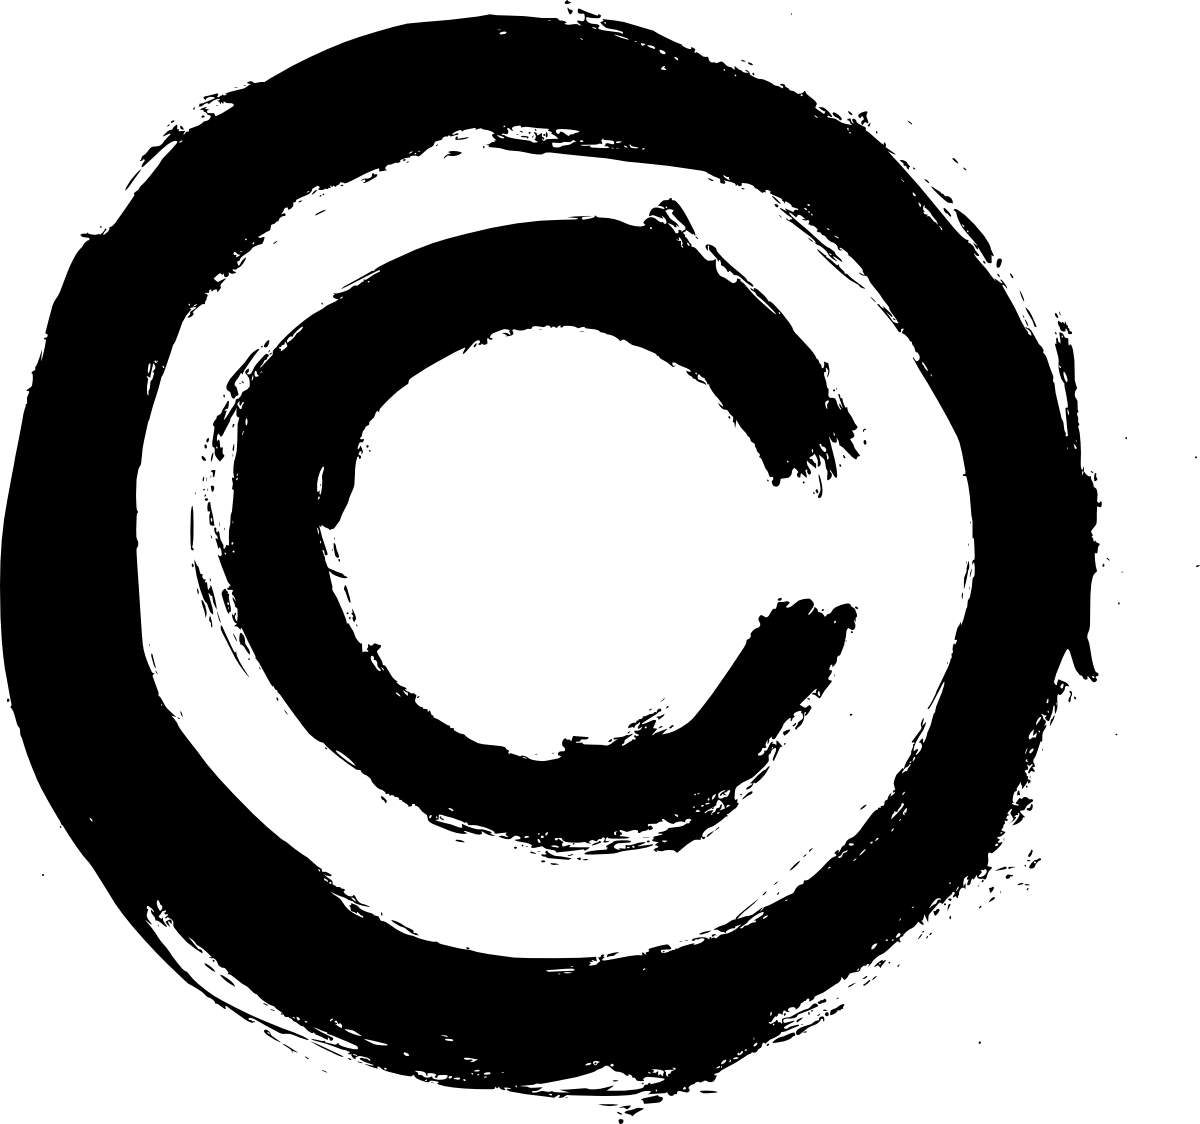 4 Grunge Copyright Symbol Png Transparent Onlygfx